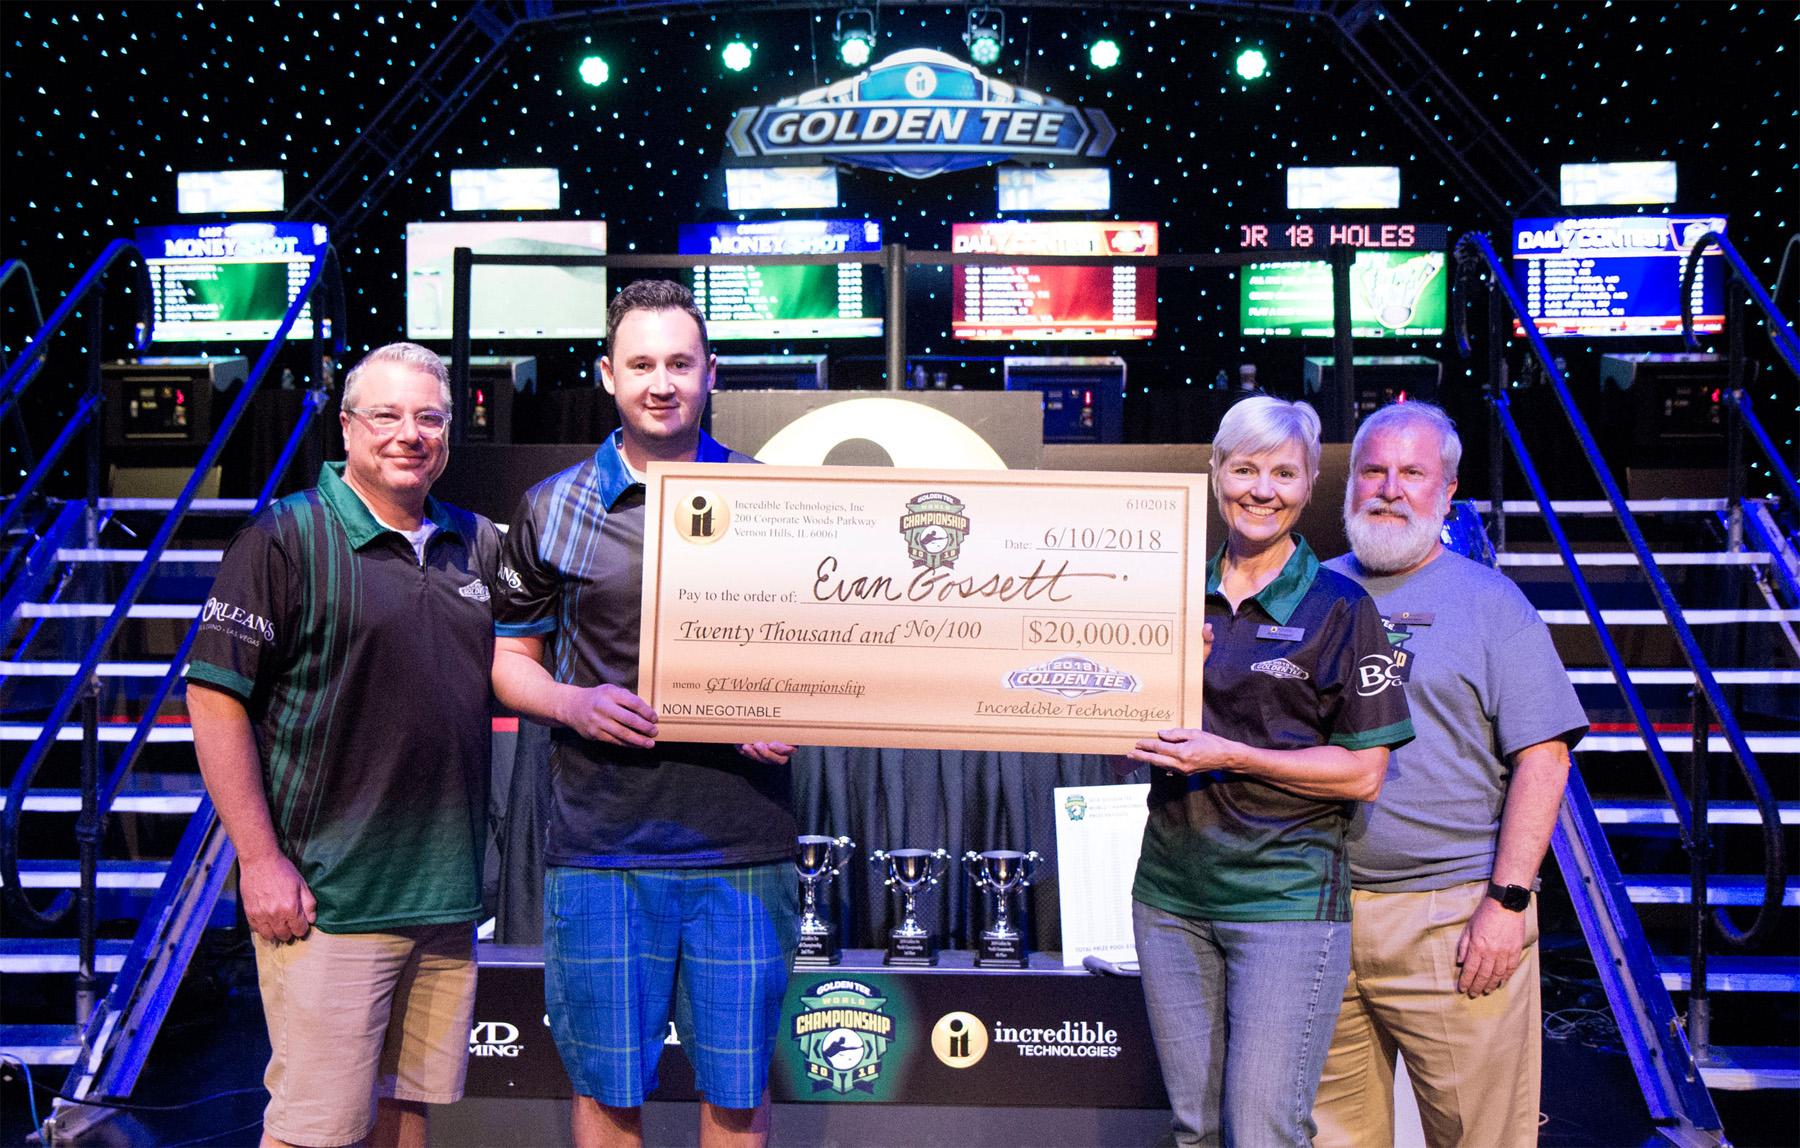 Evan Gossett receives his check for winning the 2018 World Championship